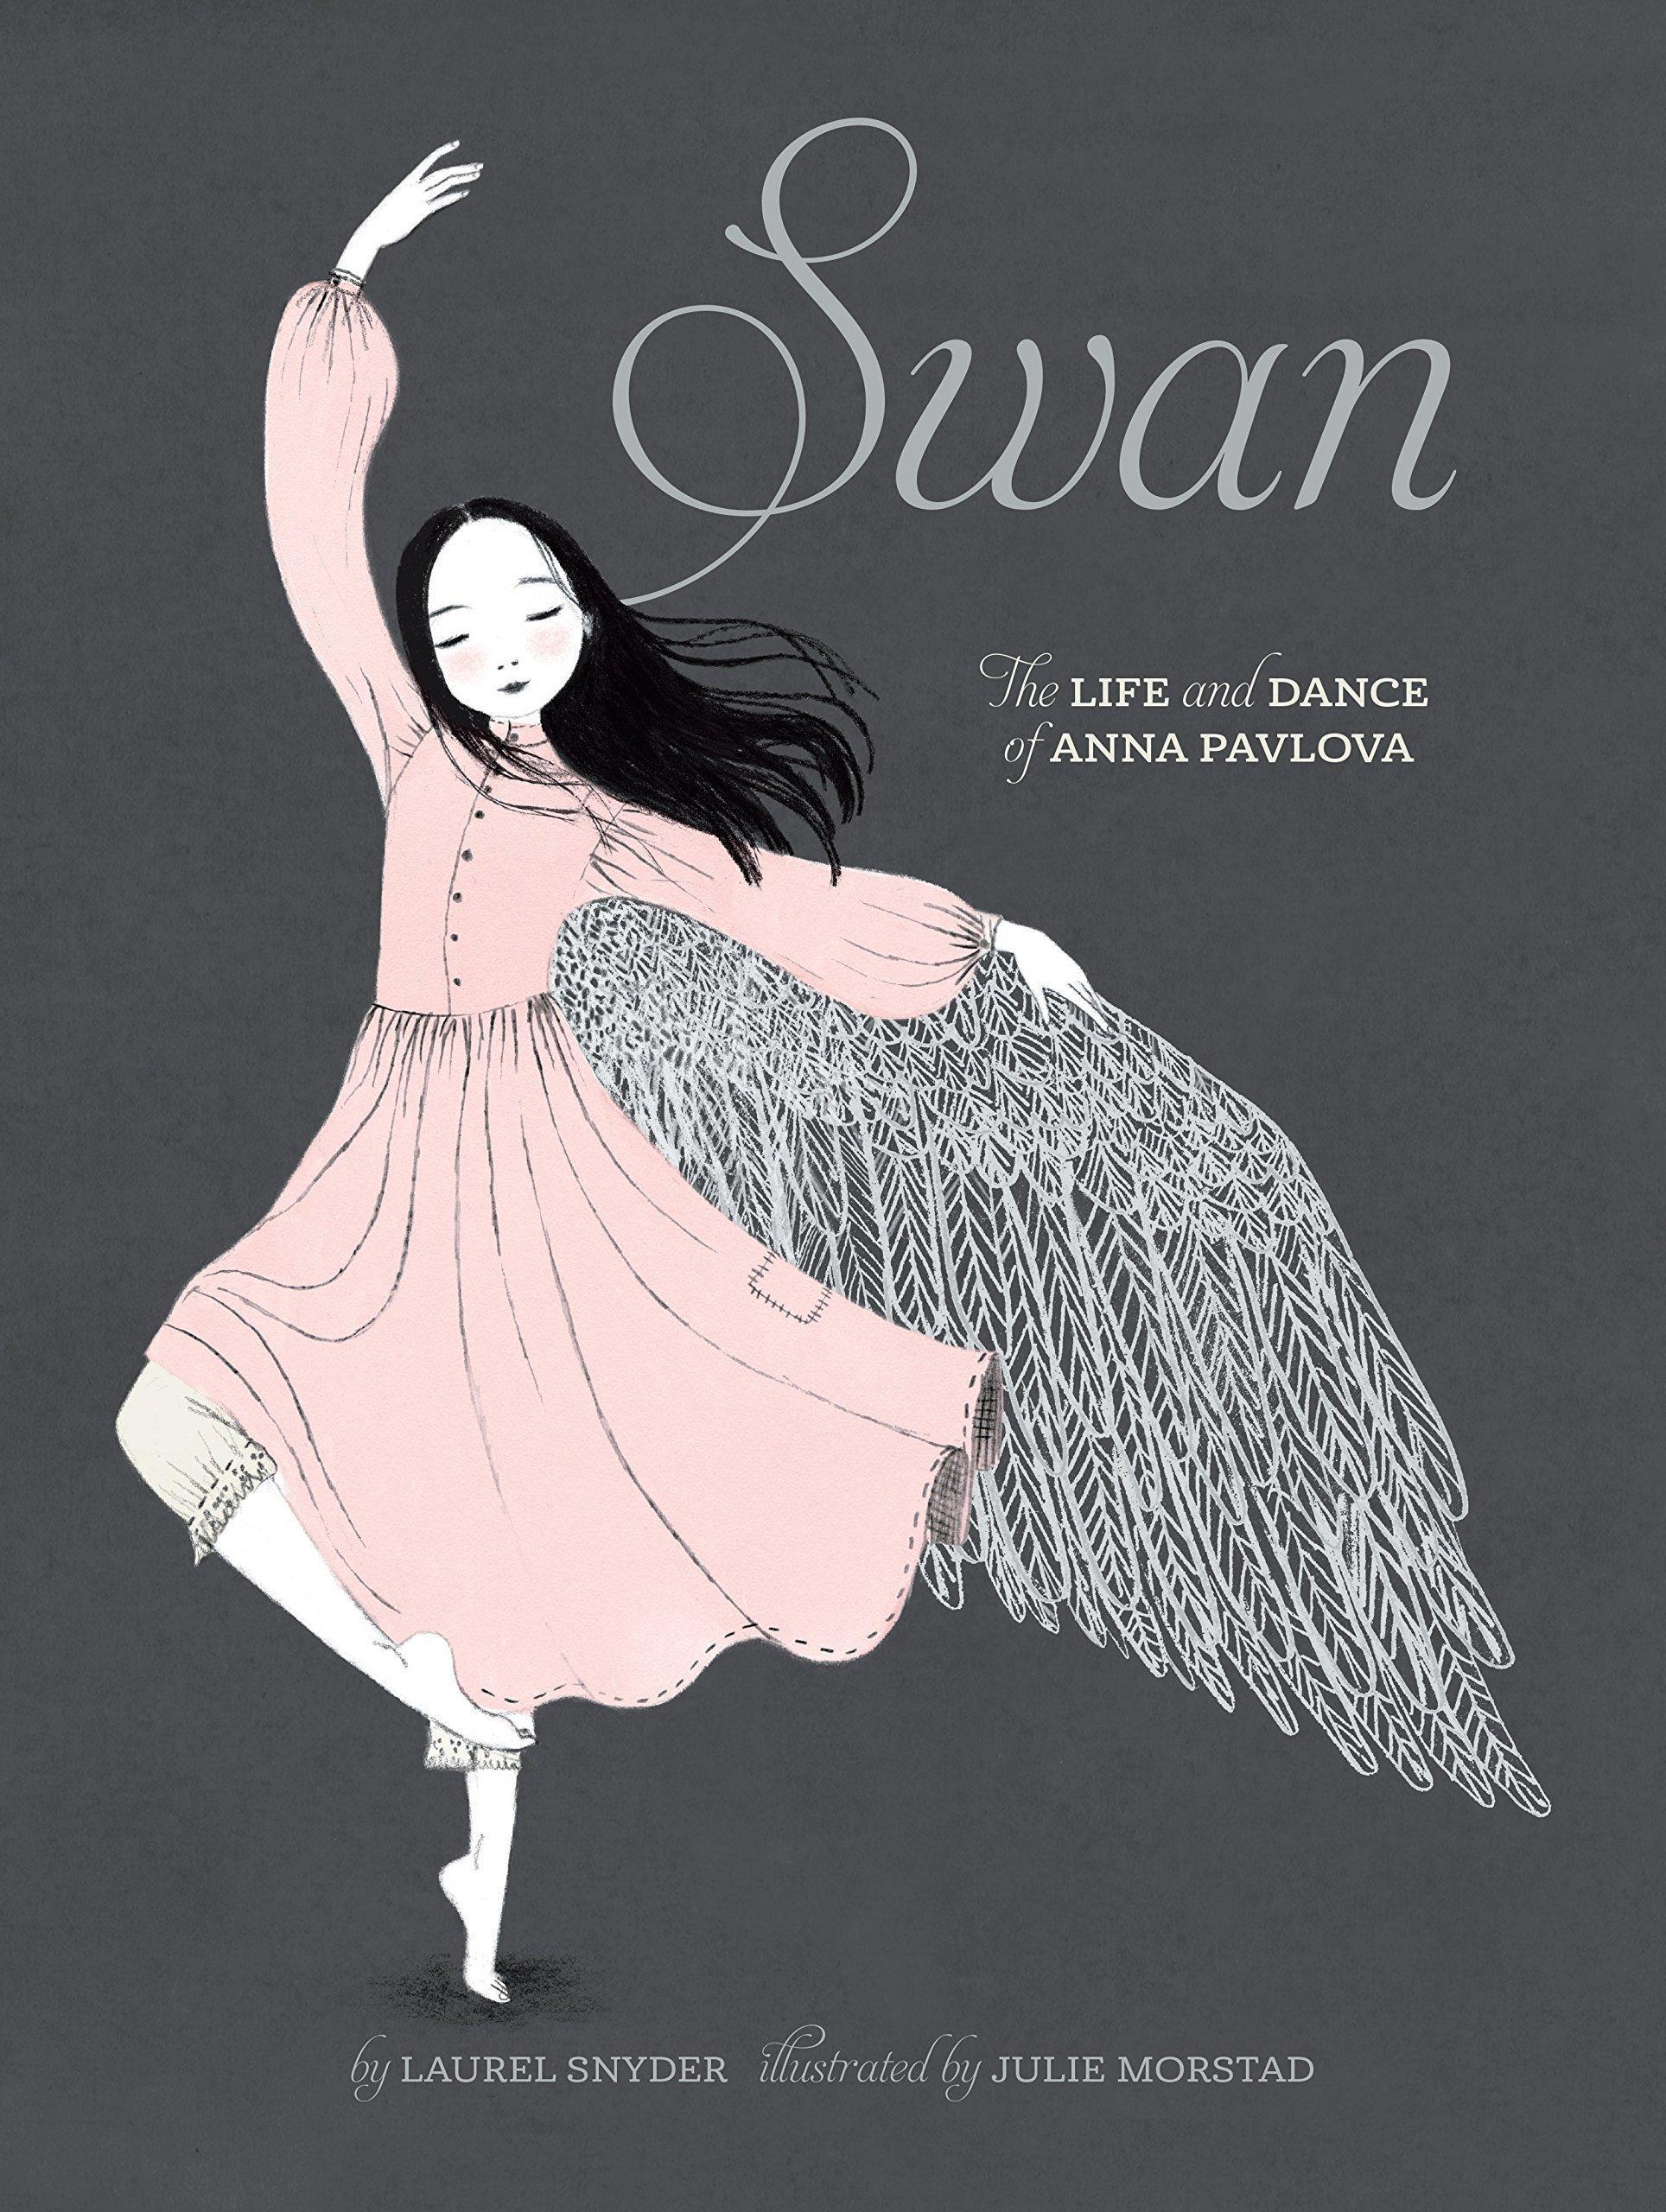 Swan: The Life and Dance ofAnnaPavlova